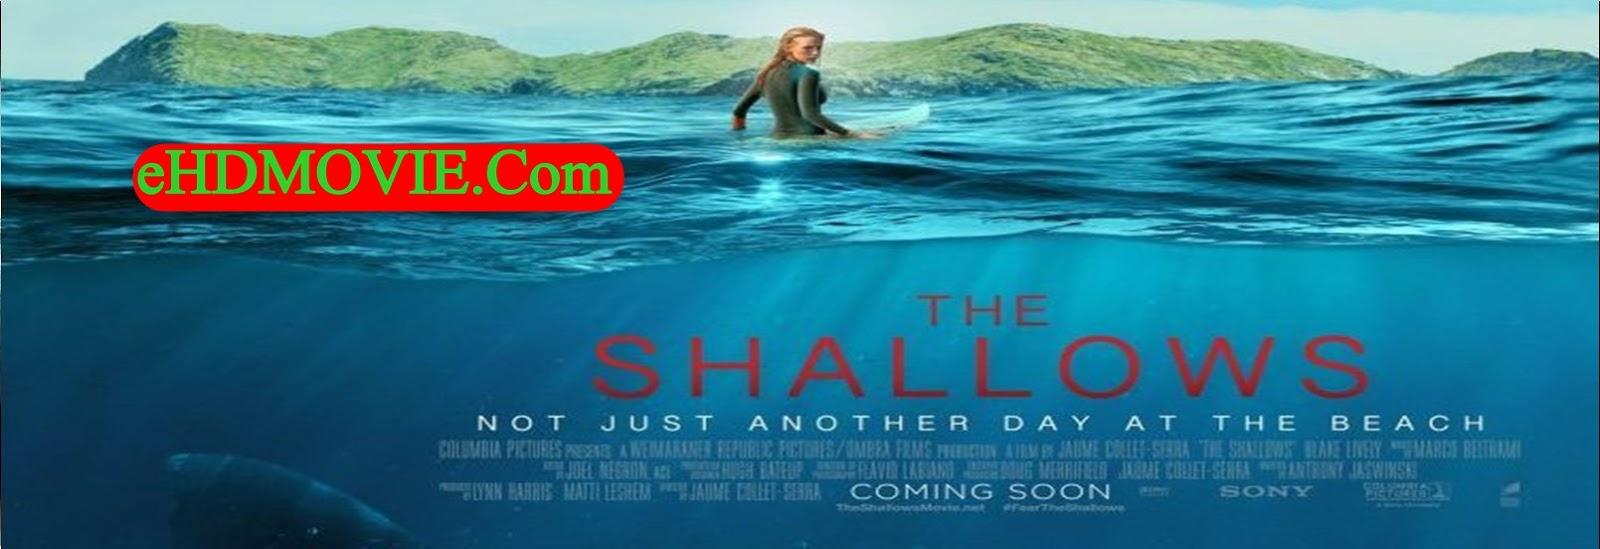 The Shallows 2016 Full Movie Dual Audio [Hindi – English] 1080p - 720p - 480p ORG BRRip 300MB - 900MB - 1.6GB ESubs Free Download